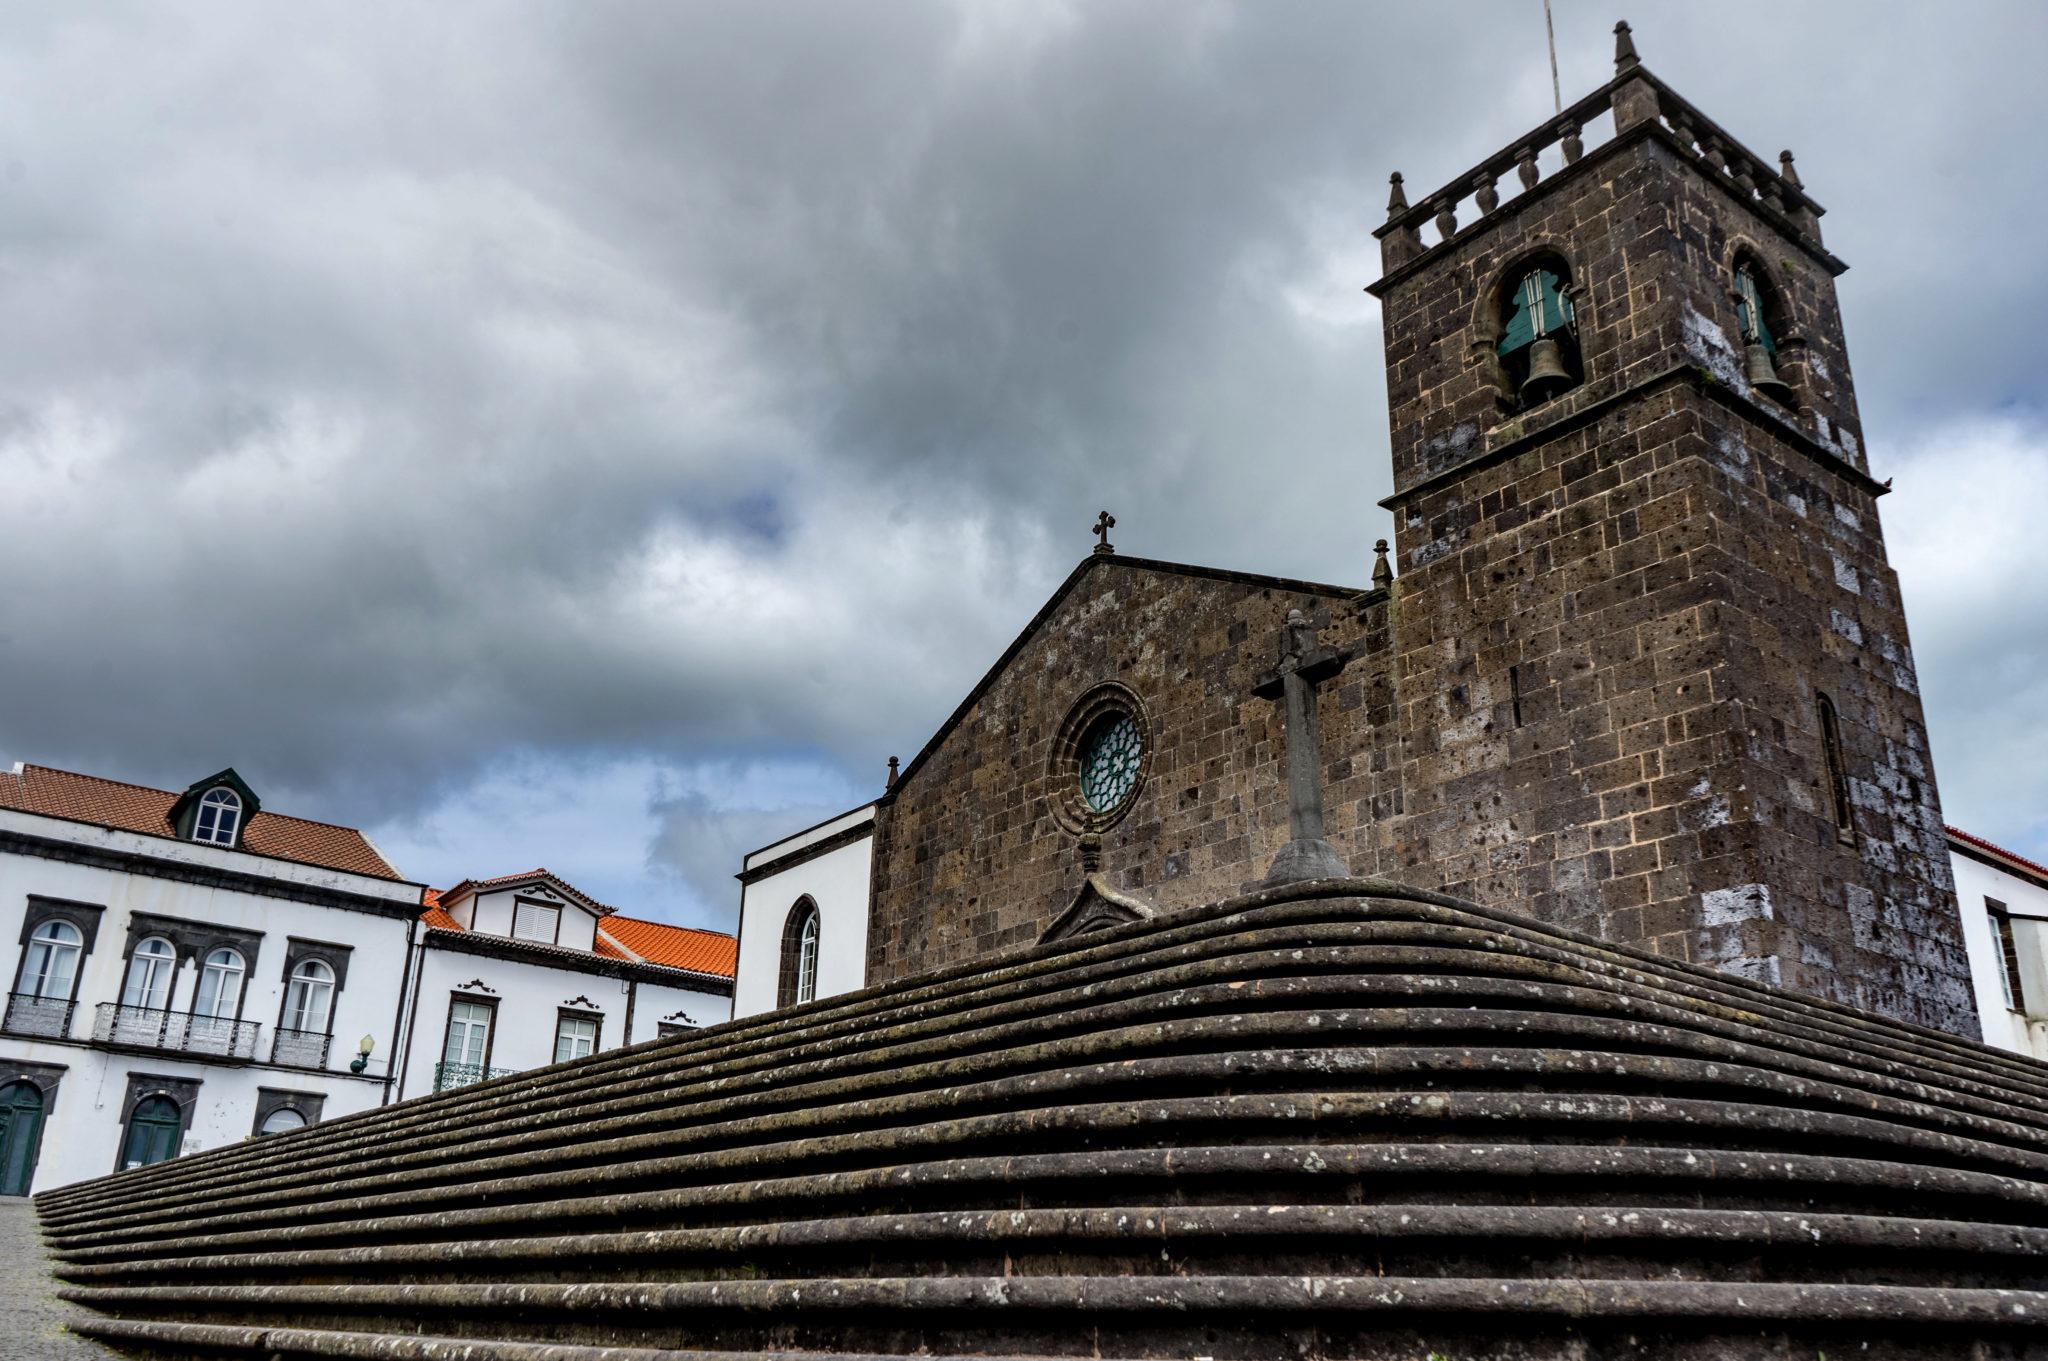 Vila Franca Do Campo